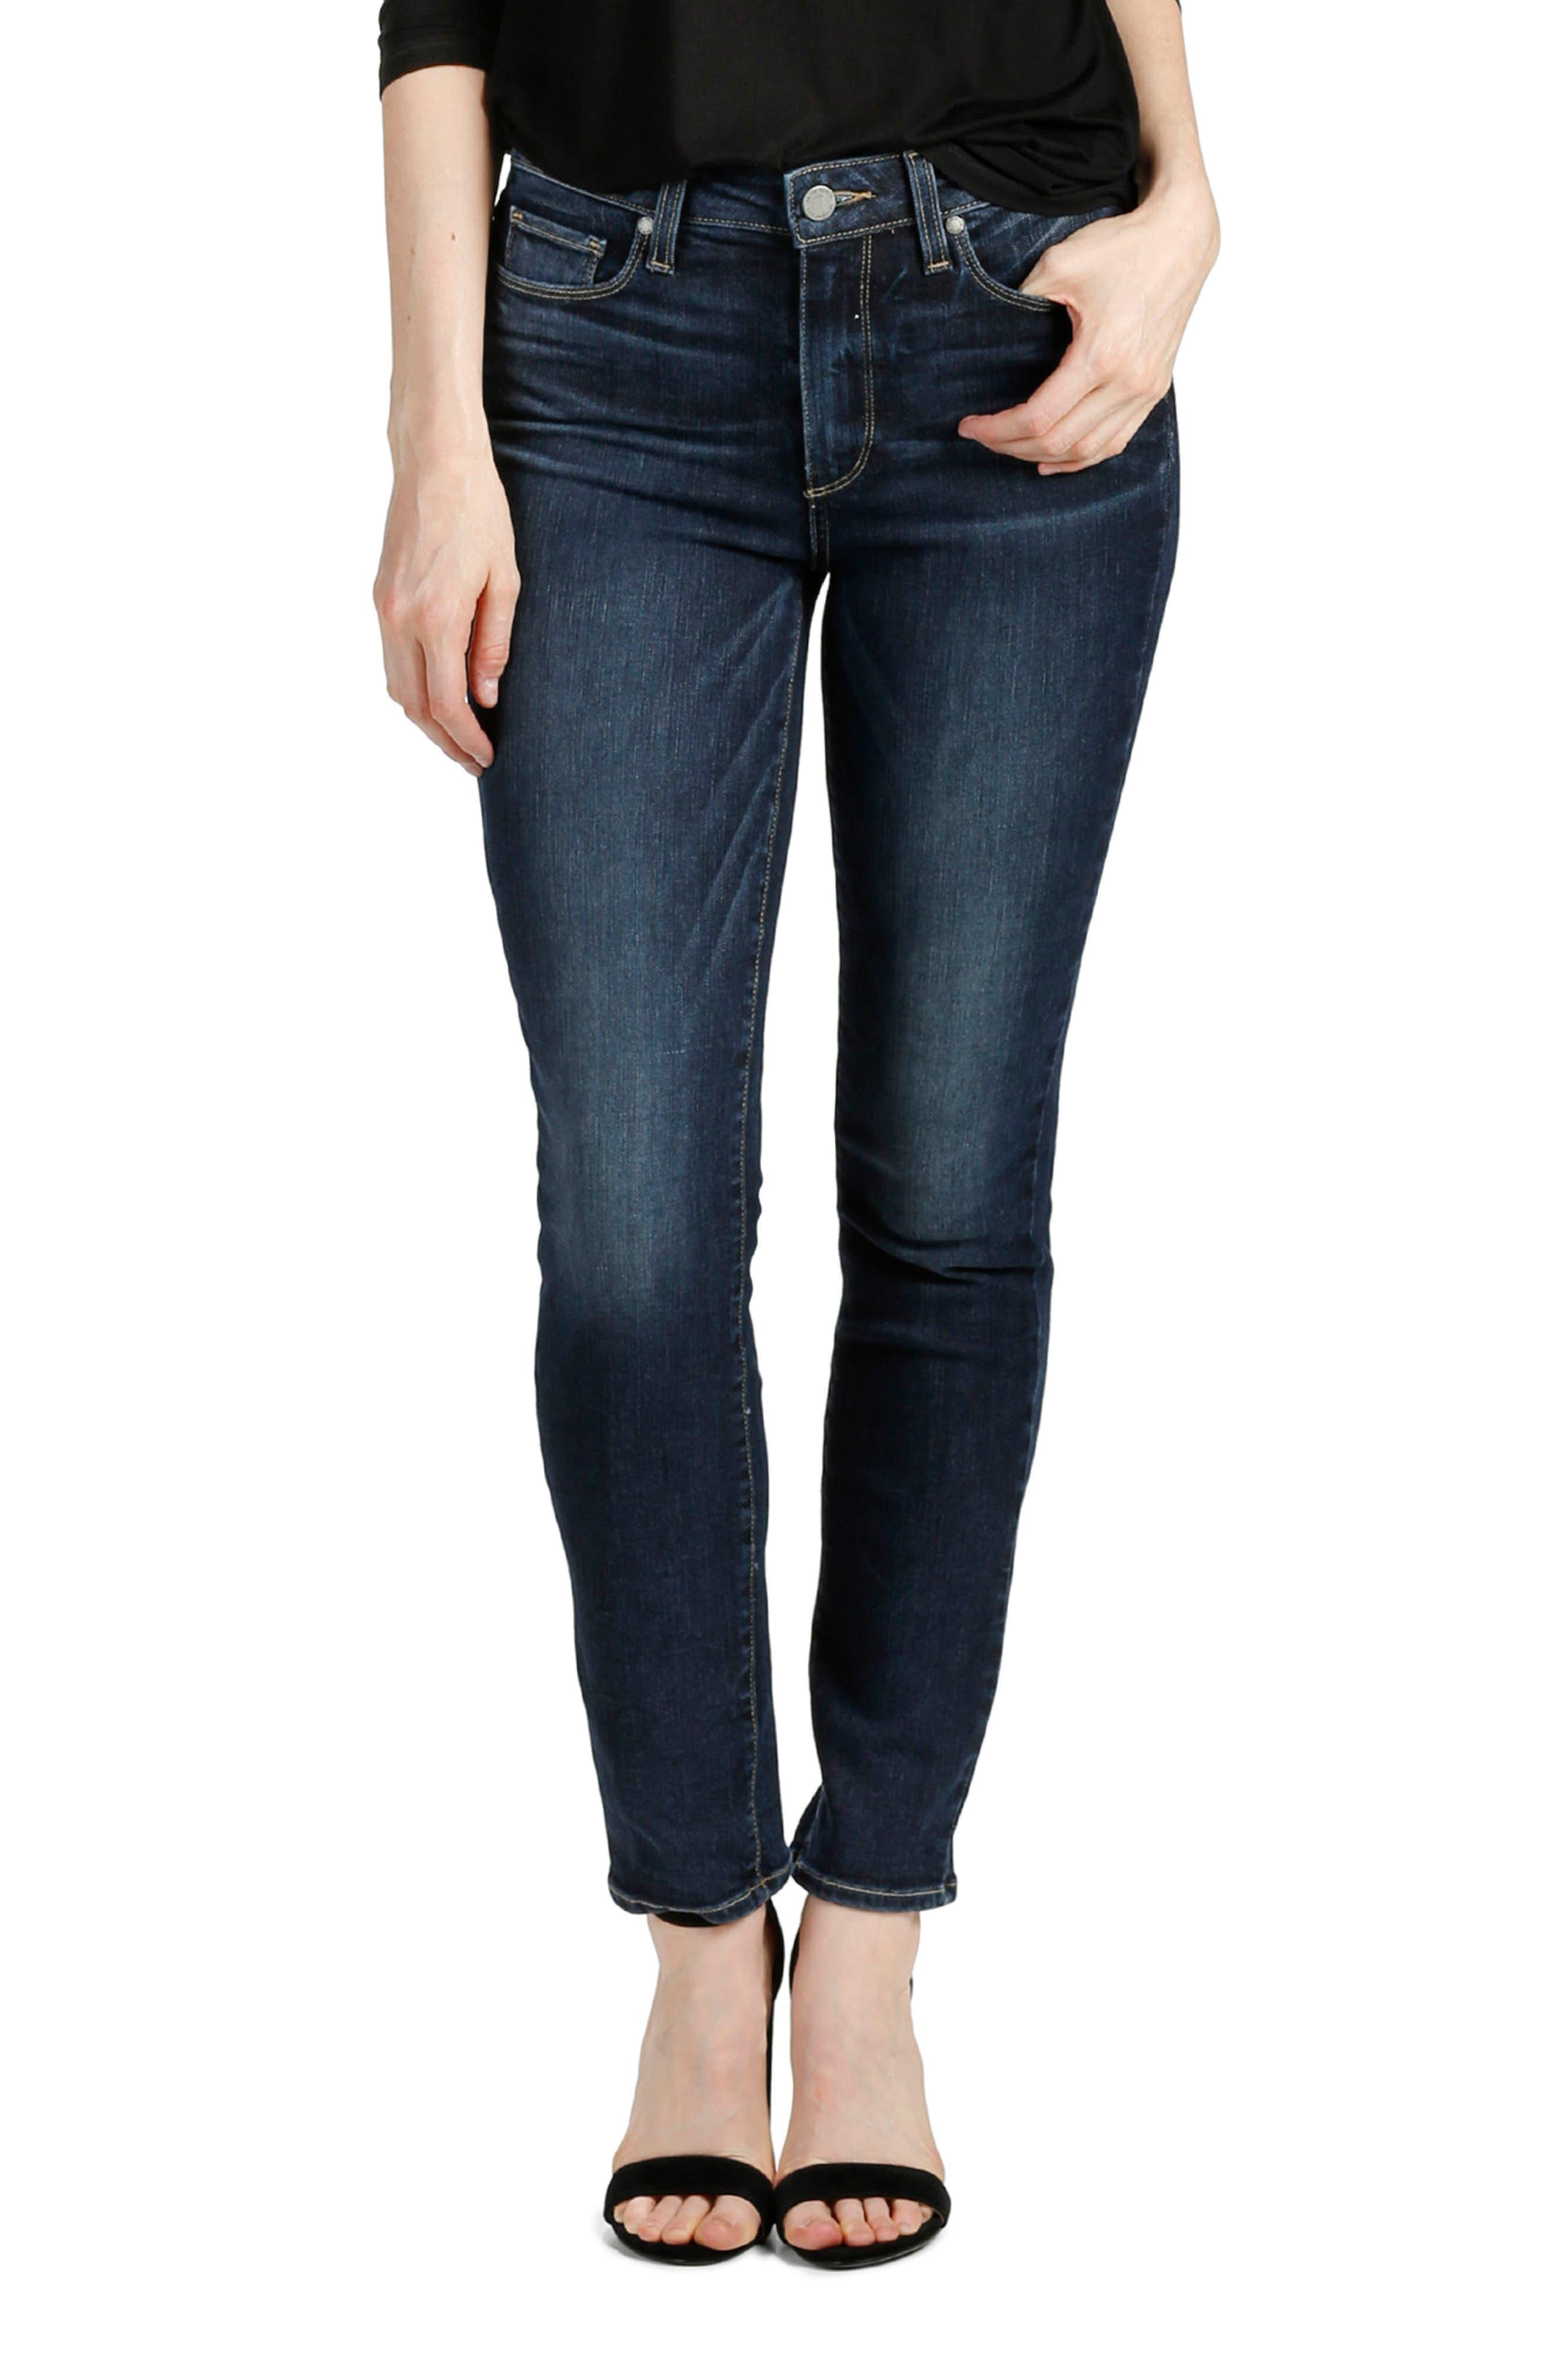 Transcend Vintage - Hoxton Ankle Peg Skinny Jeans,                             Main thumbnail 1, color,                             400